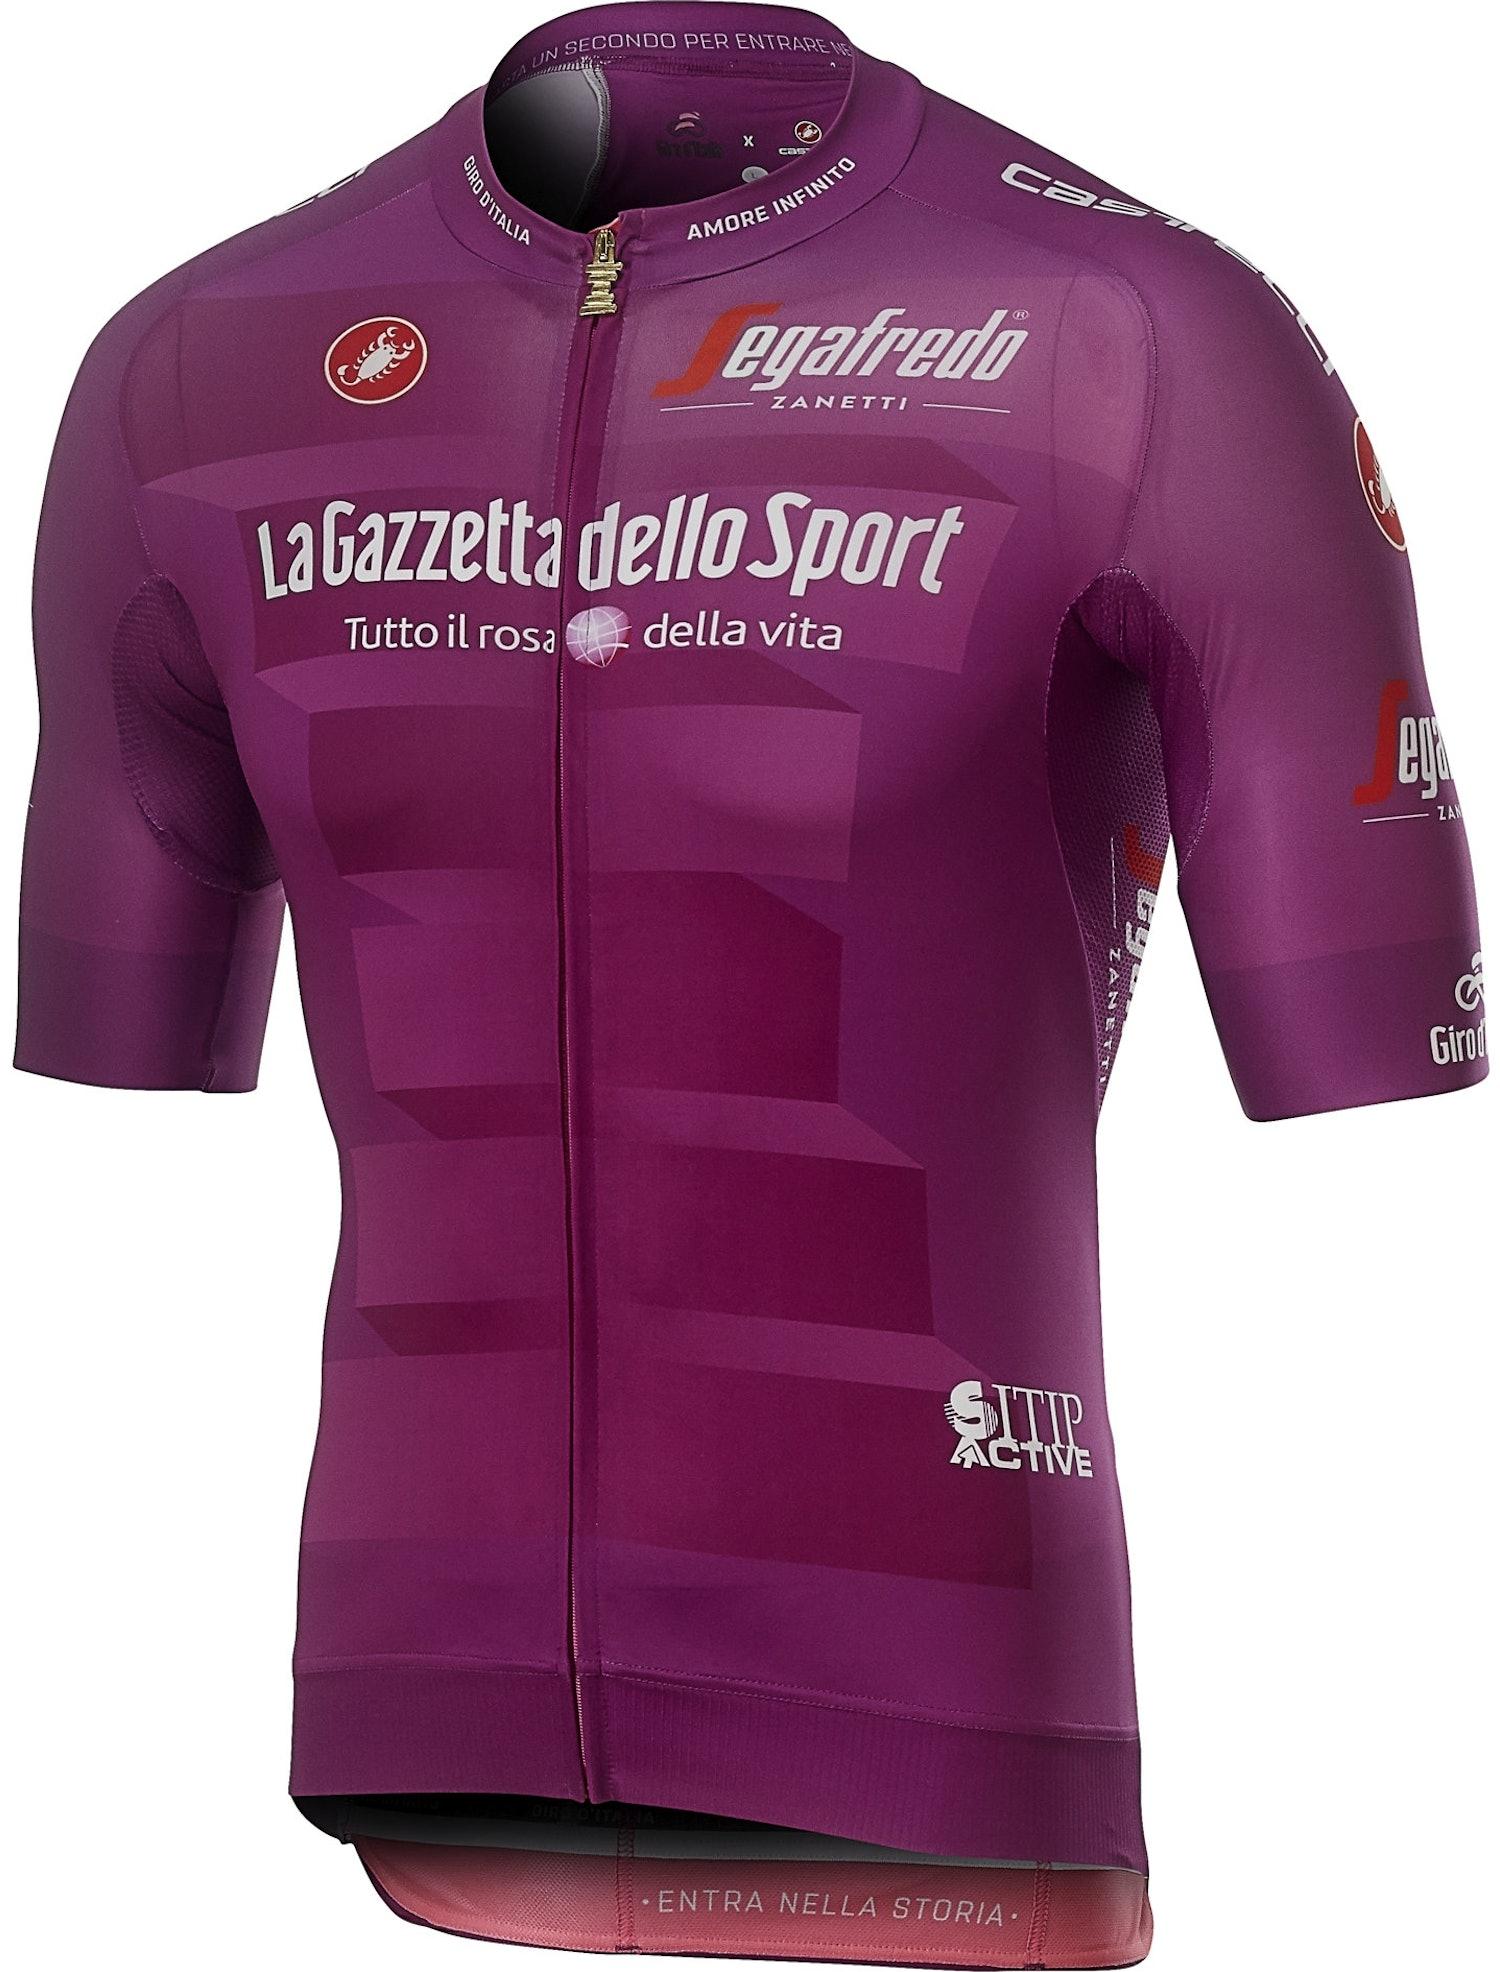 cb6a67eba382 Castelli Maglia Ciclamino Race Giro d'Italia 2019 - uomo   Sportler.com